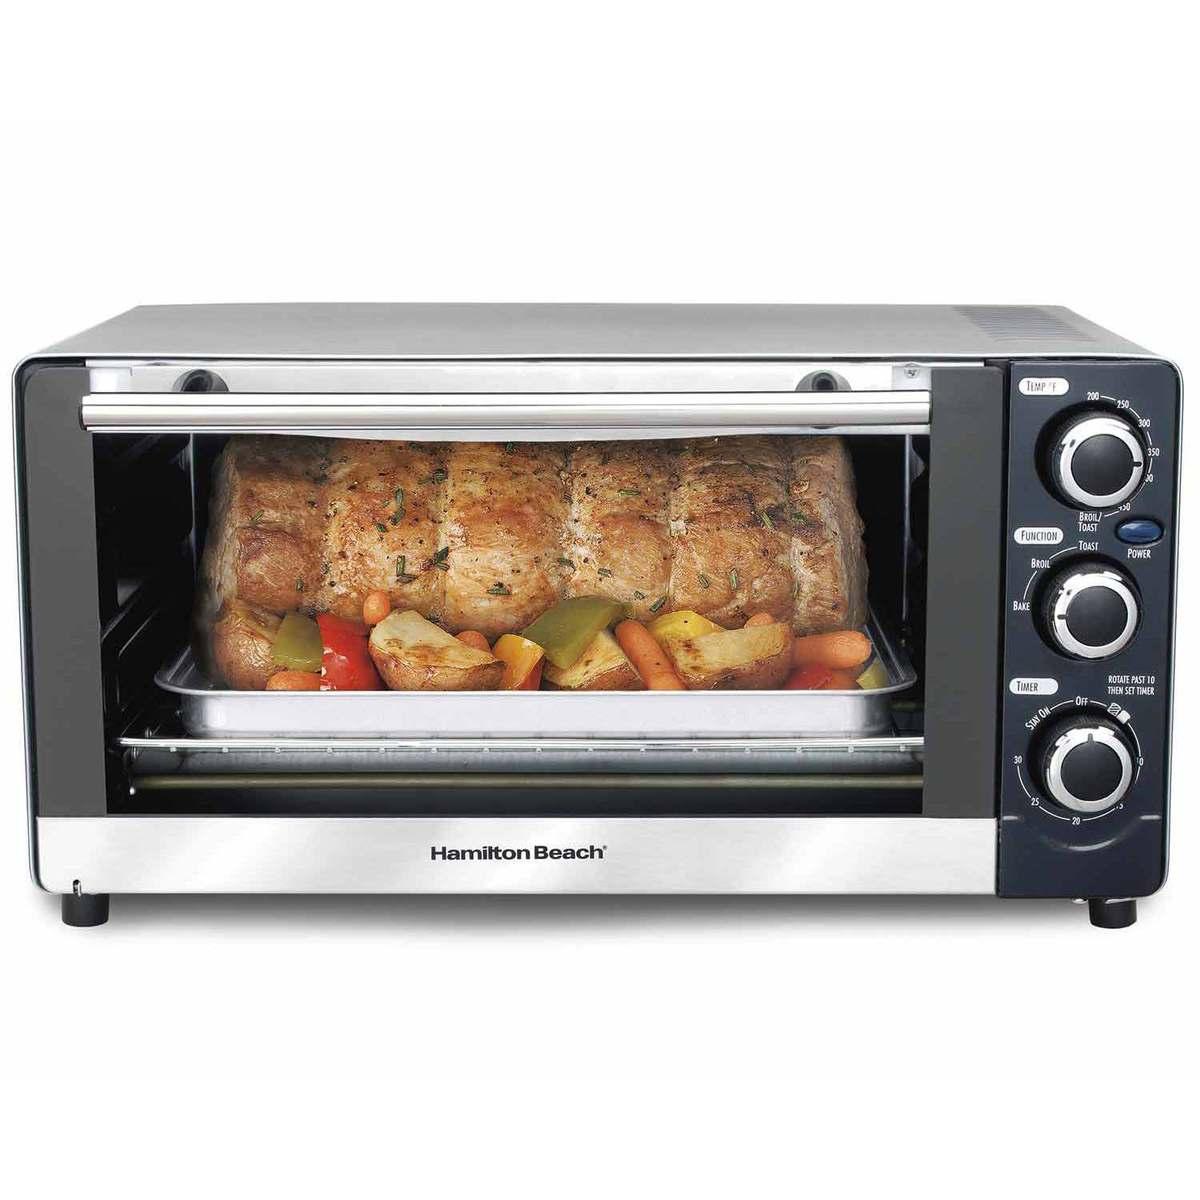 6 Slice Toaster Oven (31409)